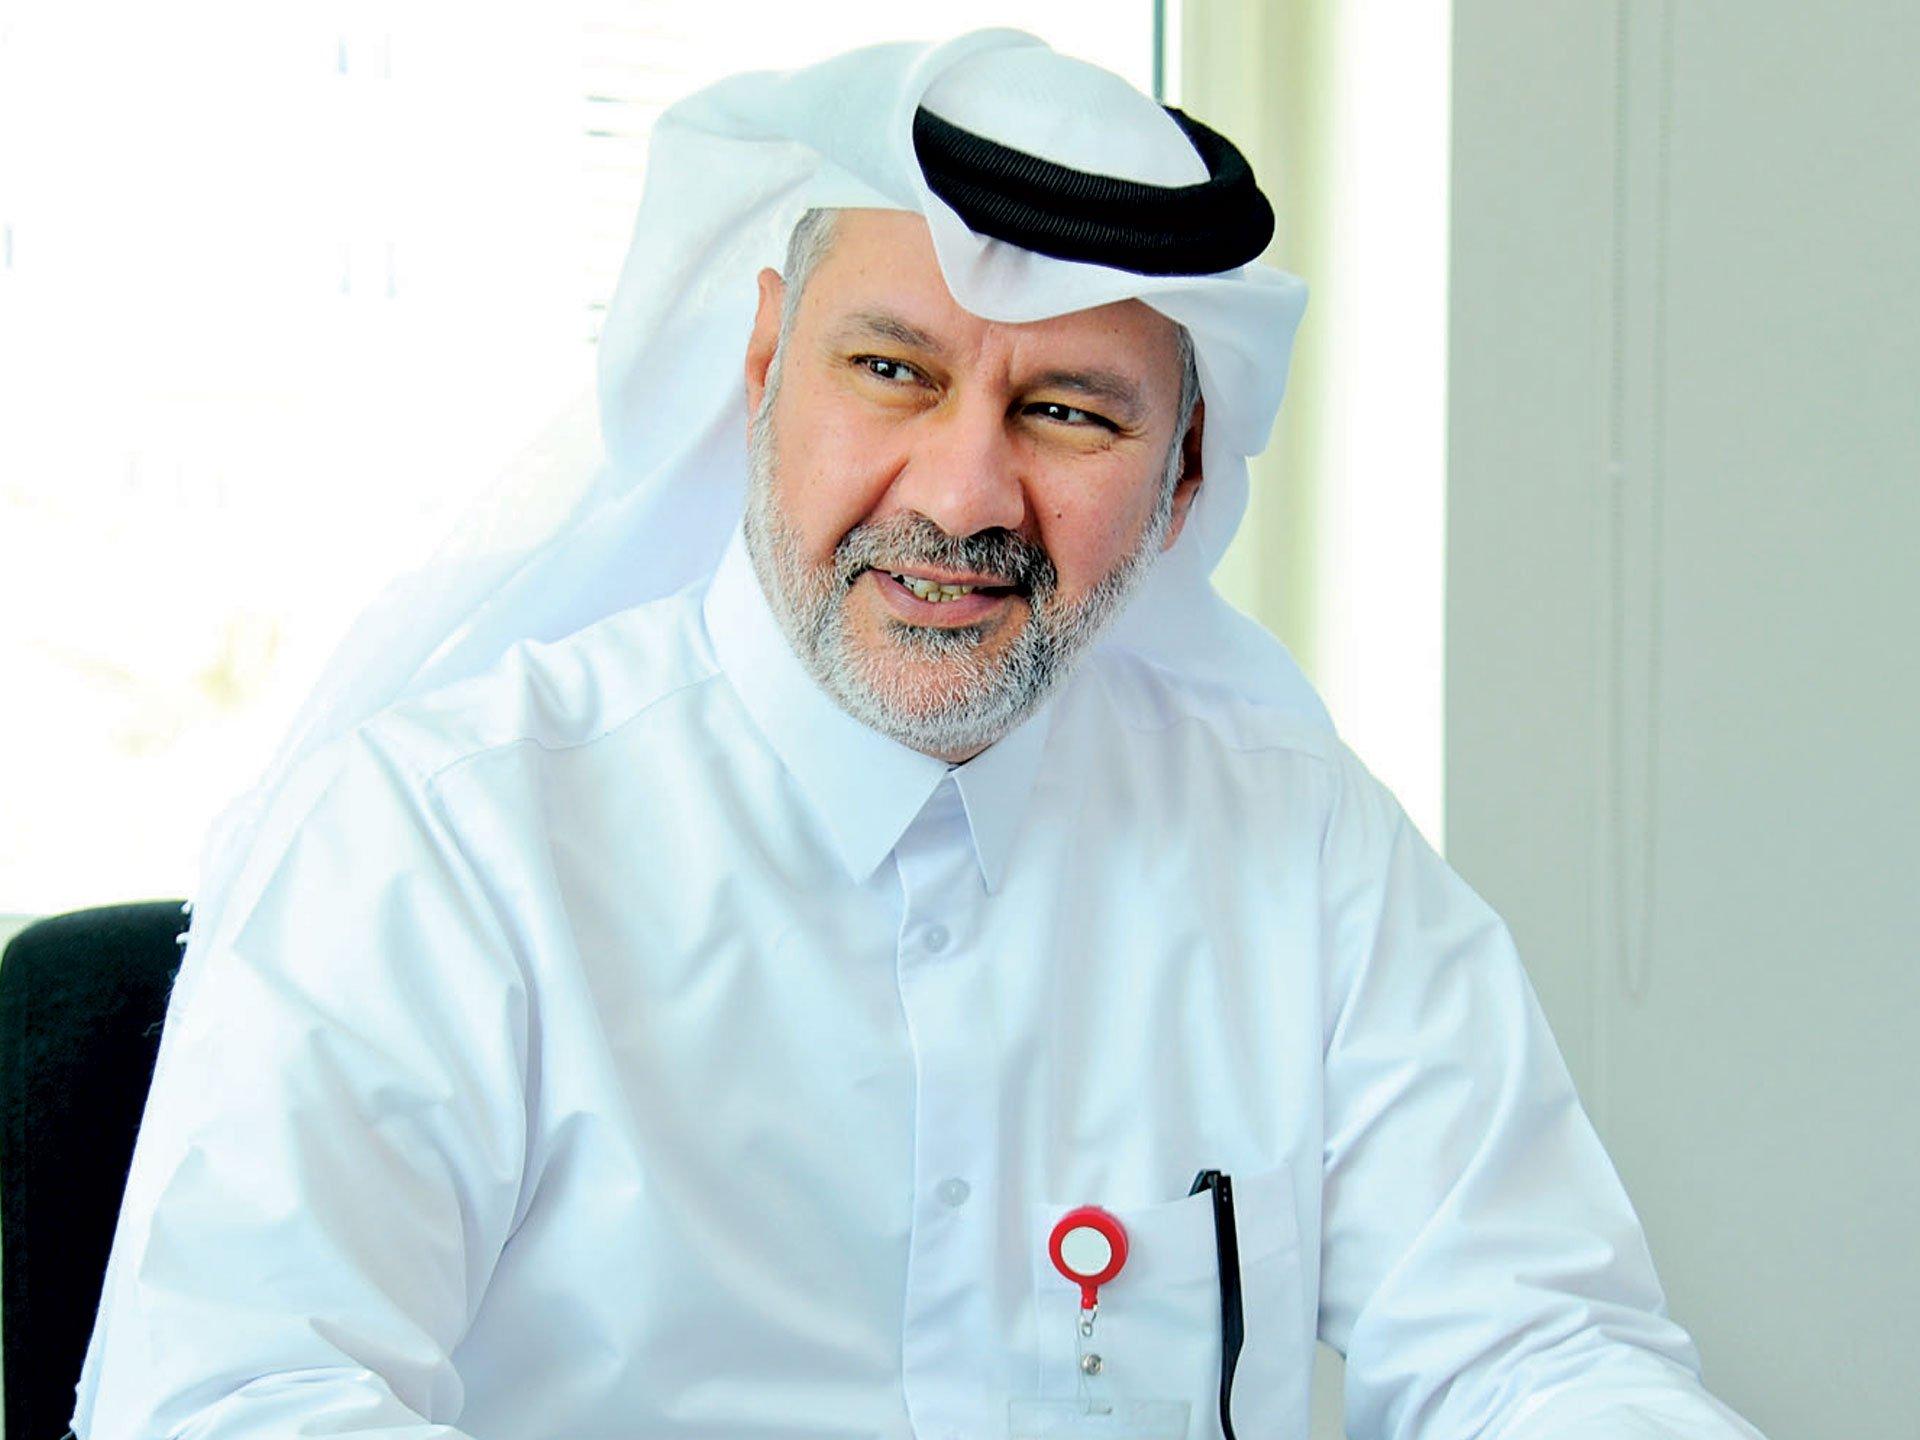 Delta variant is widespread among children: Dr. Nasser Al Ansari